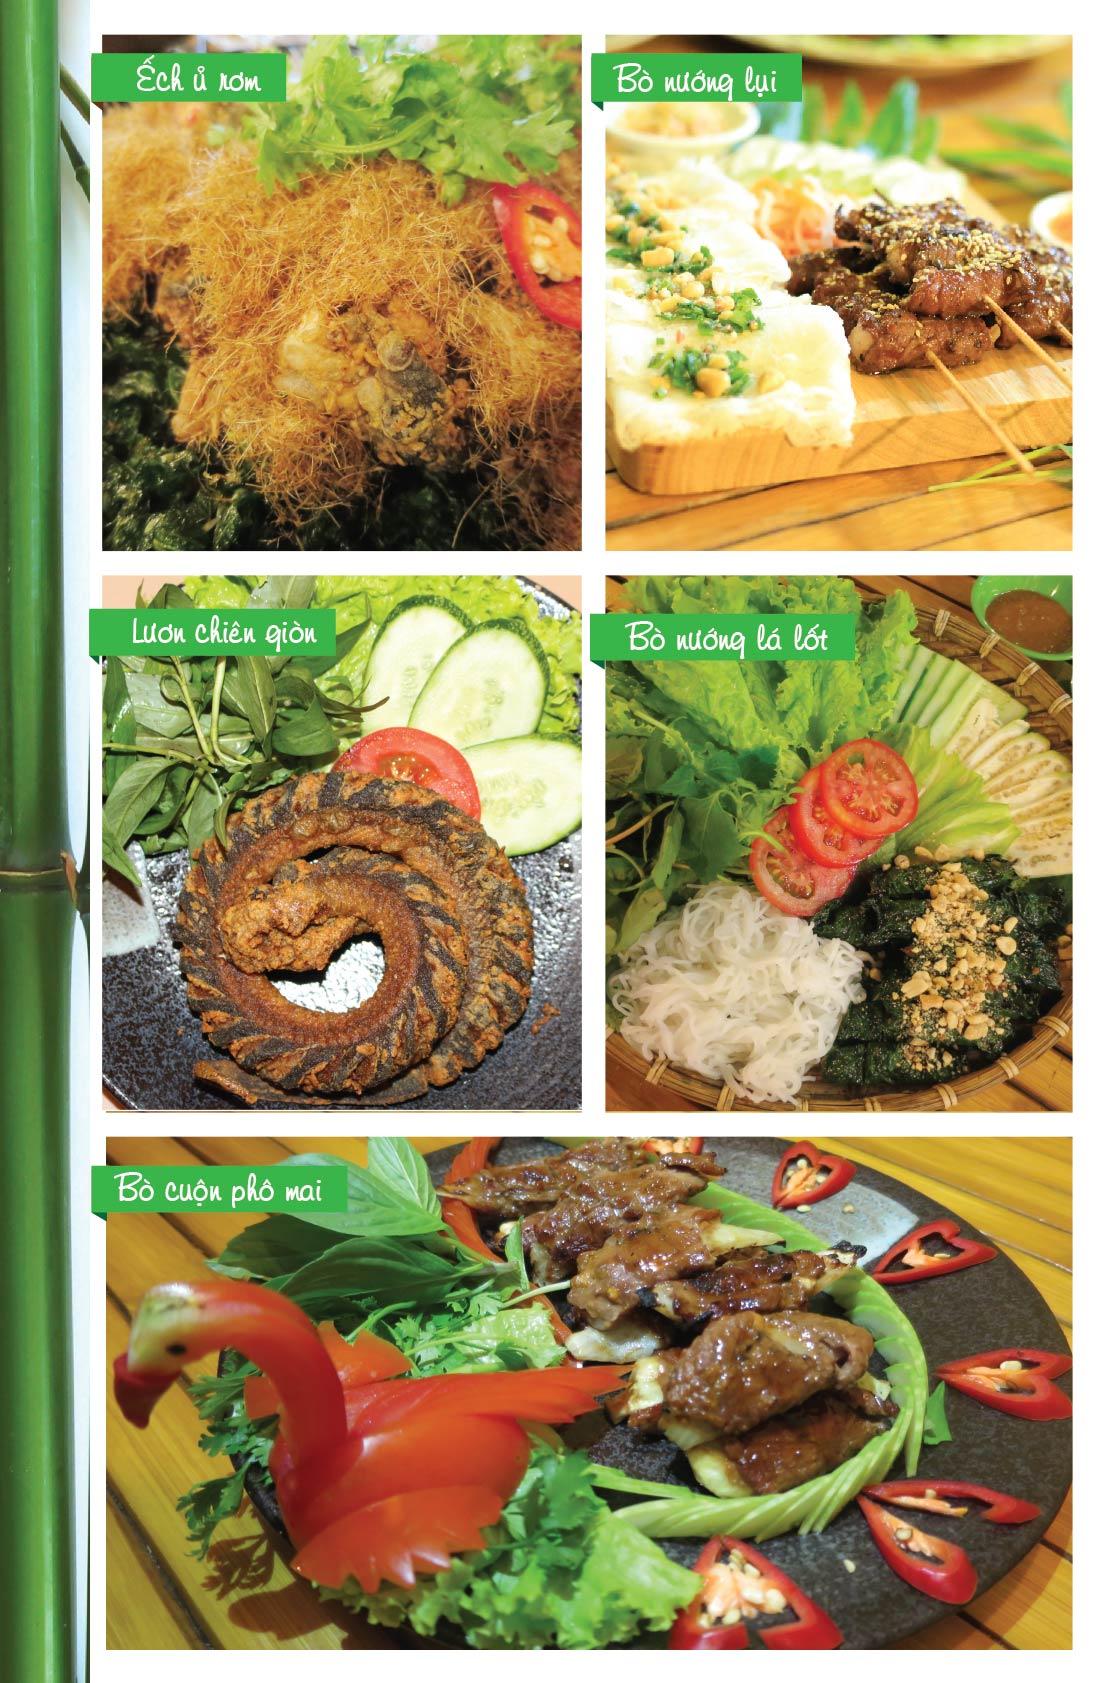 17-10_menu-bamboo-09